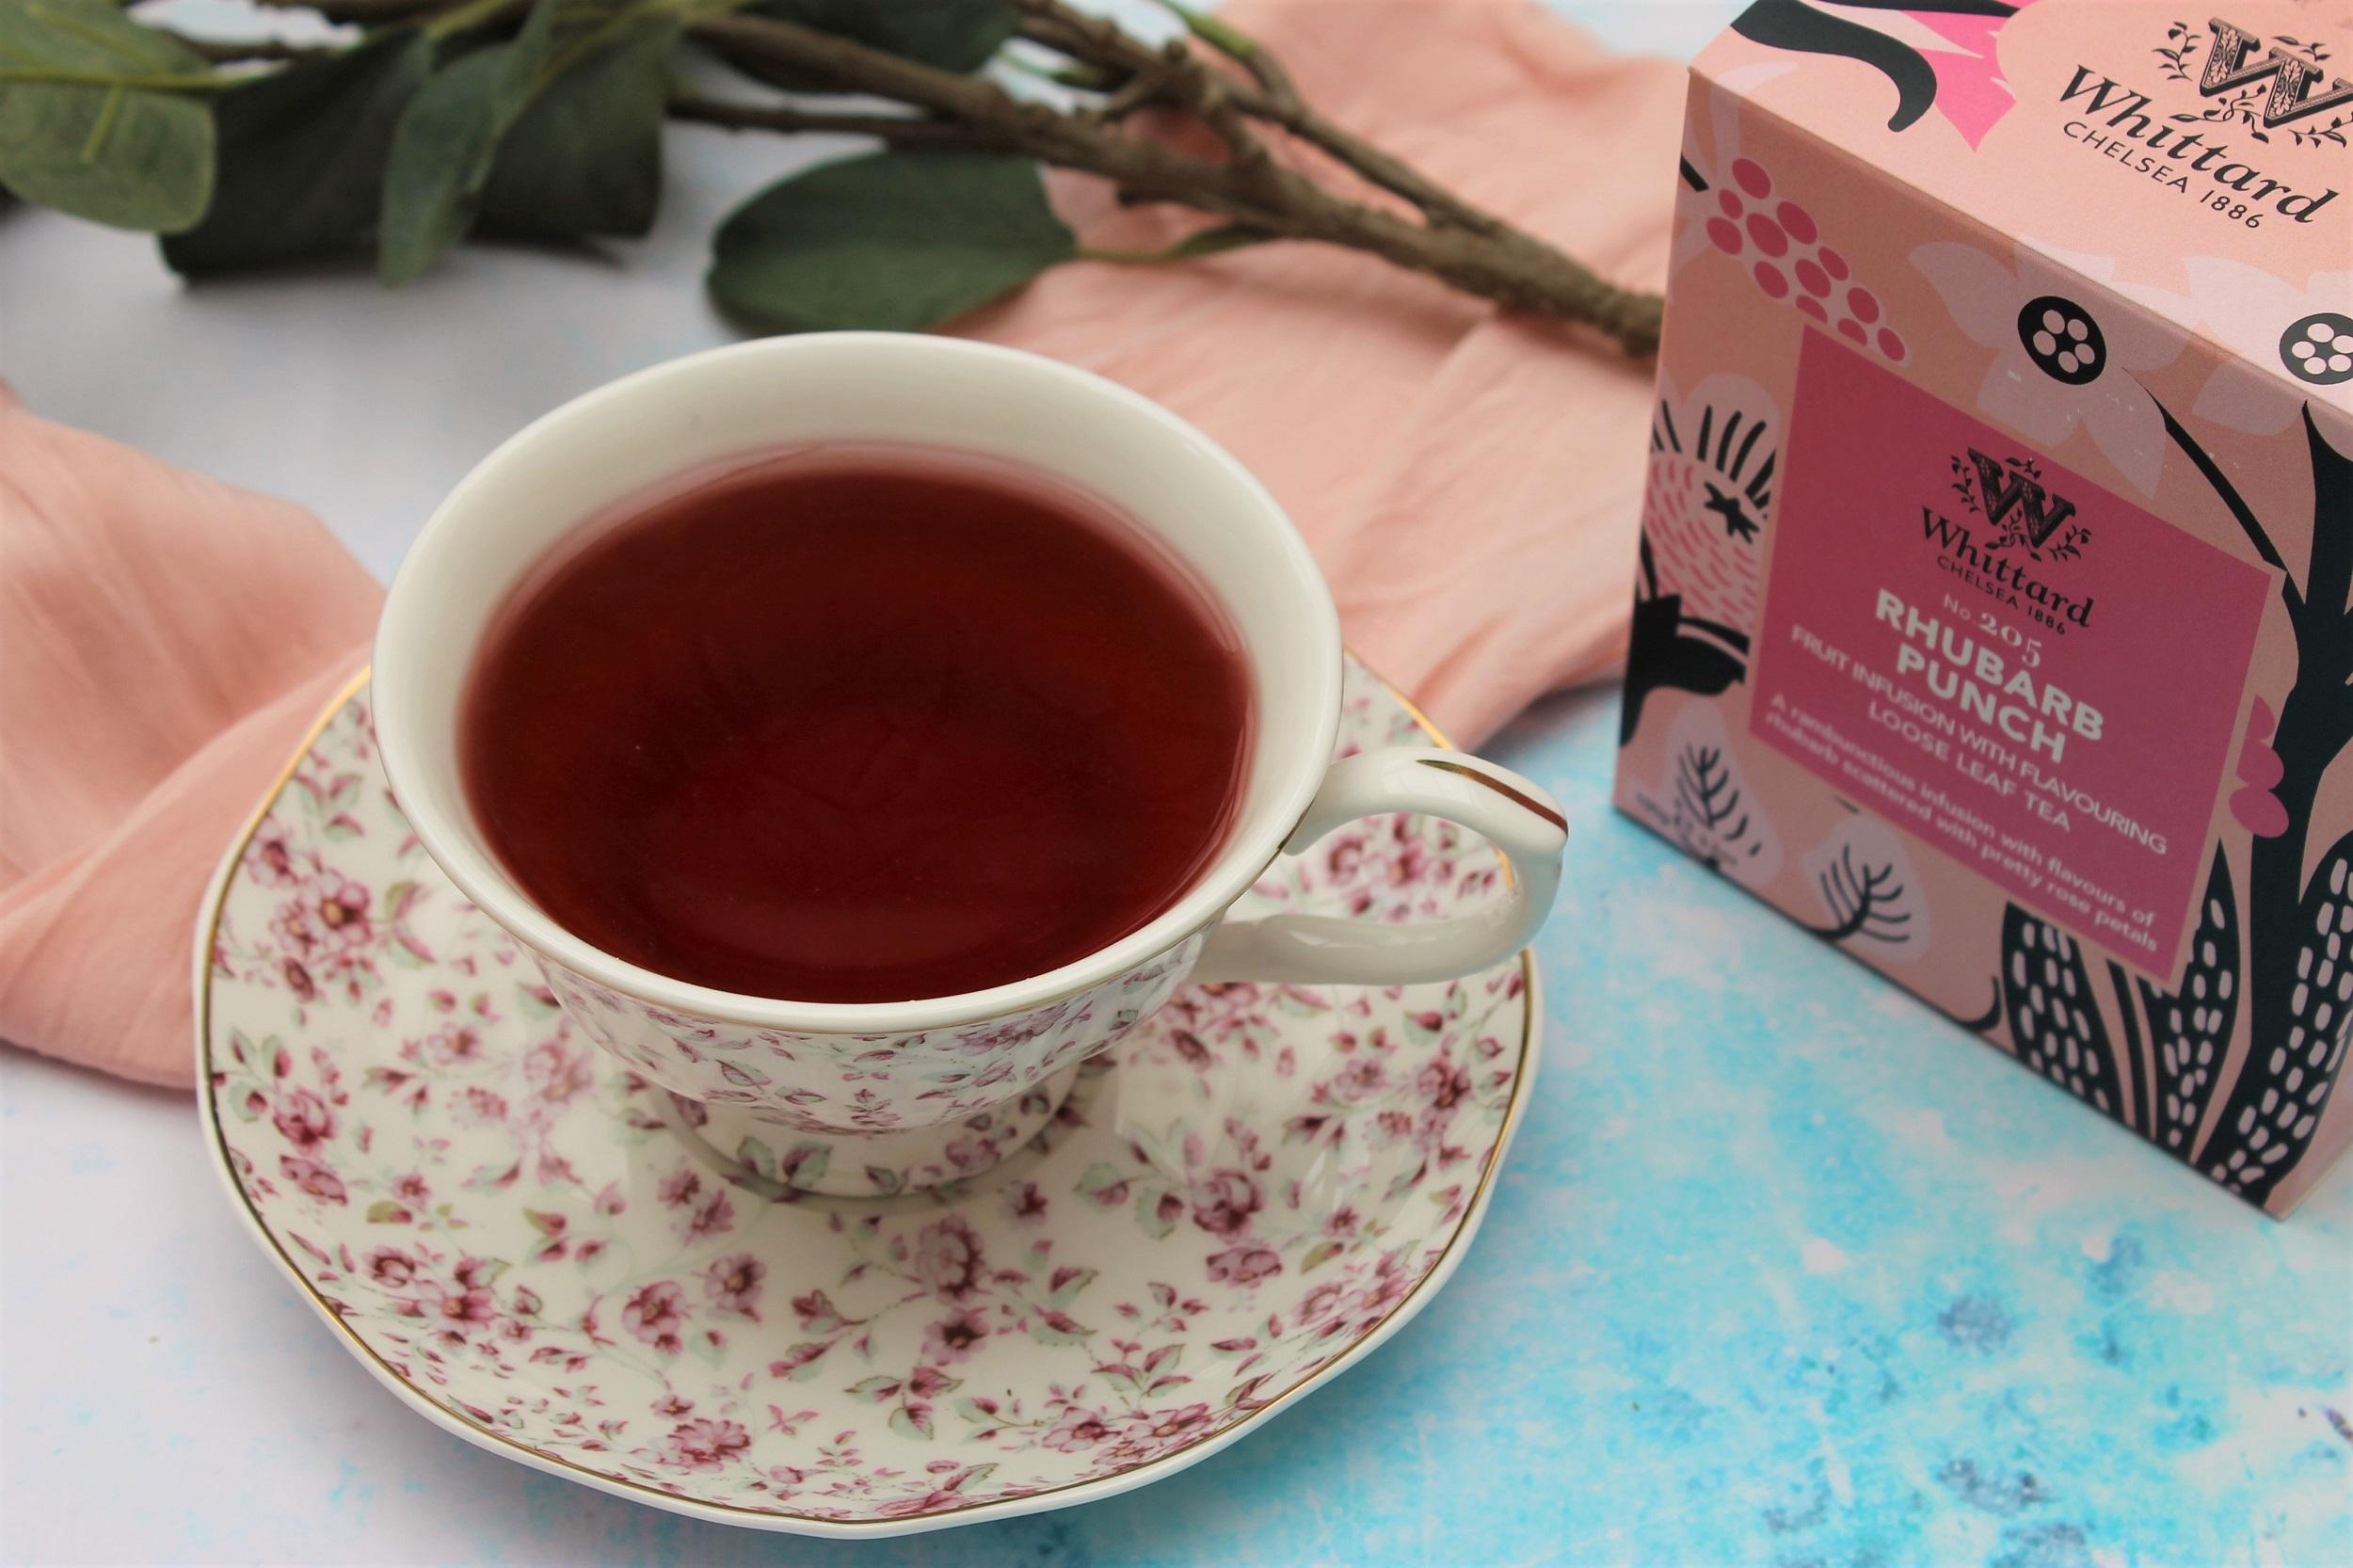 rhubarb punch fruit tea review